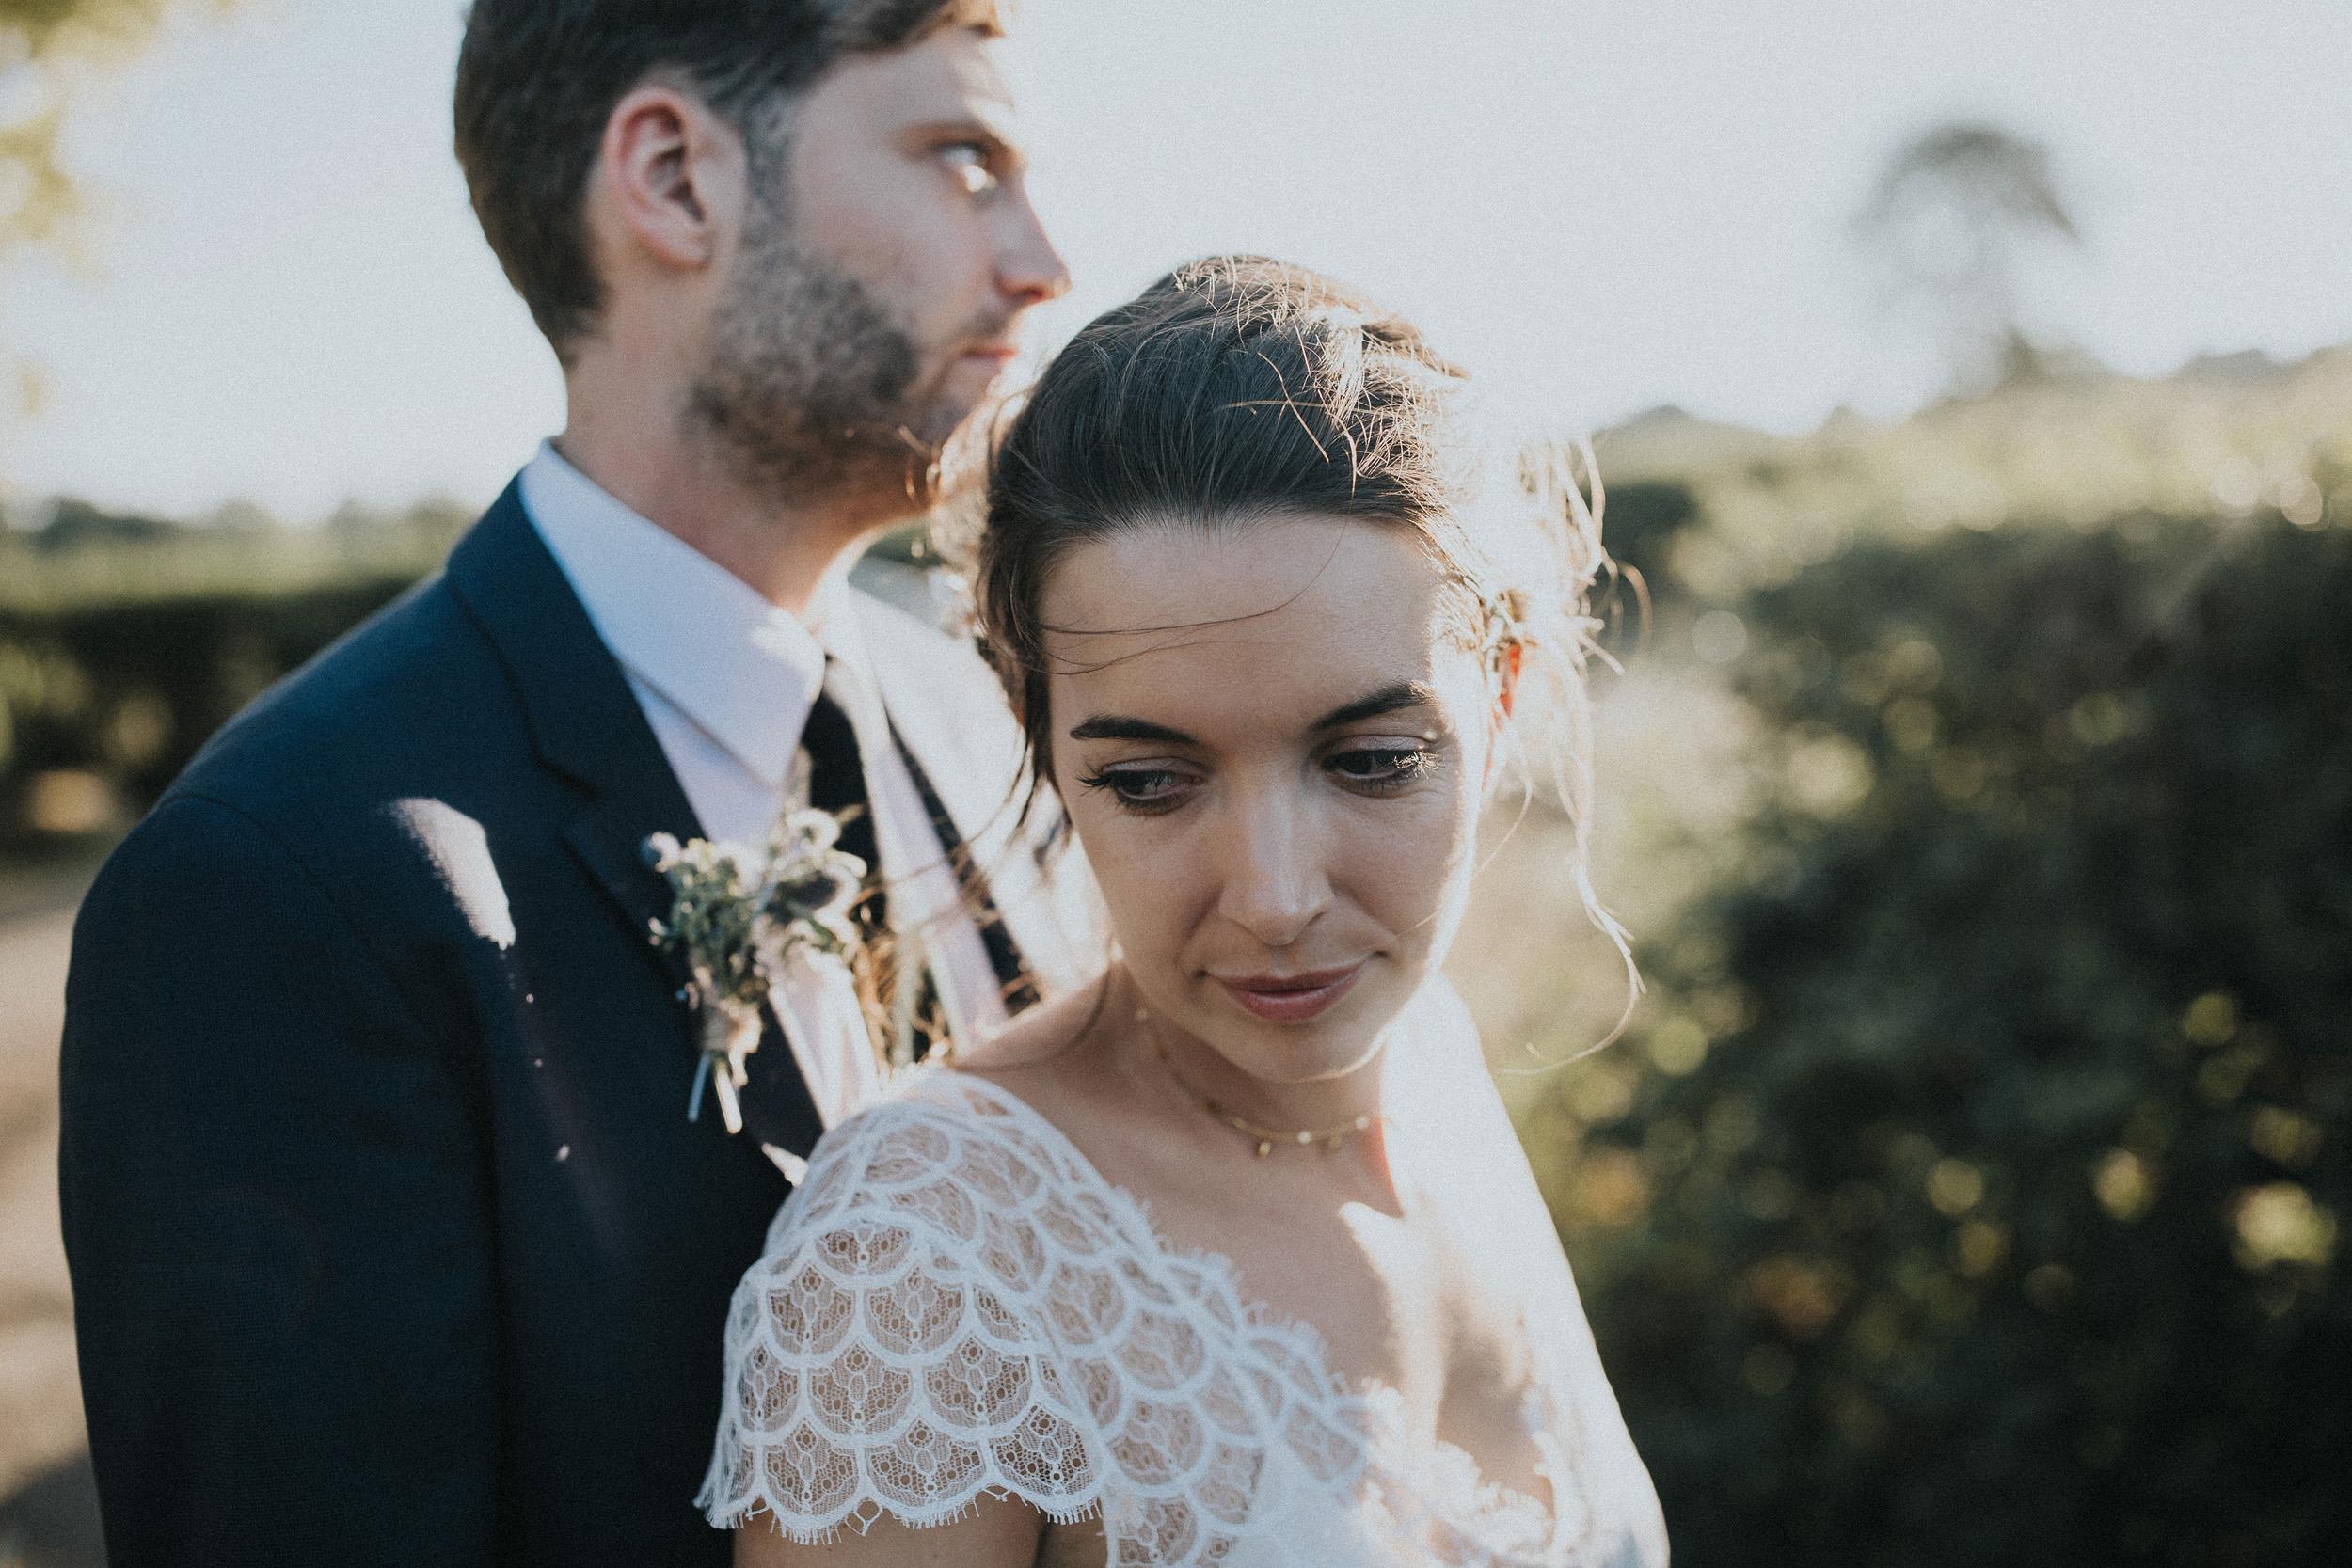 Martha-Laid-Back-Garden-Wedding-Lace-Wedding-Dress-Bohemian-Kate-Beaumont-57.jpg